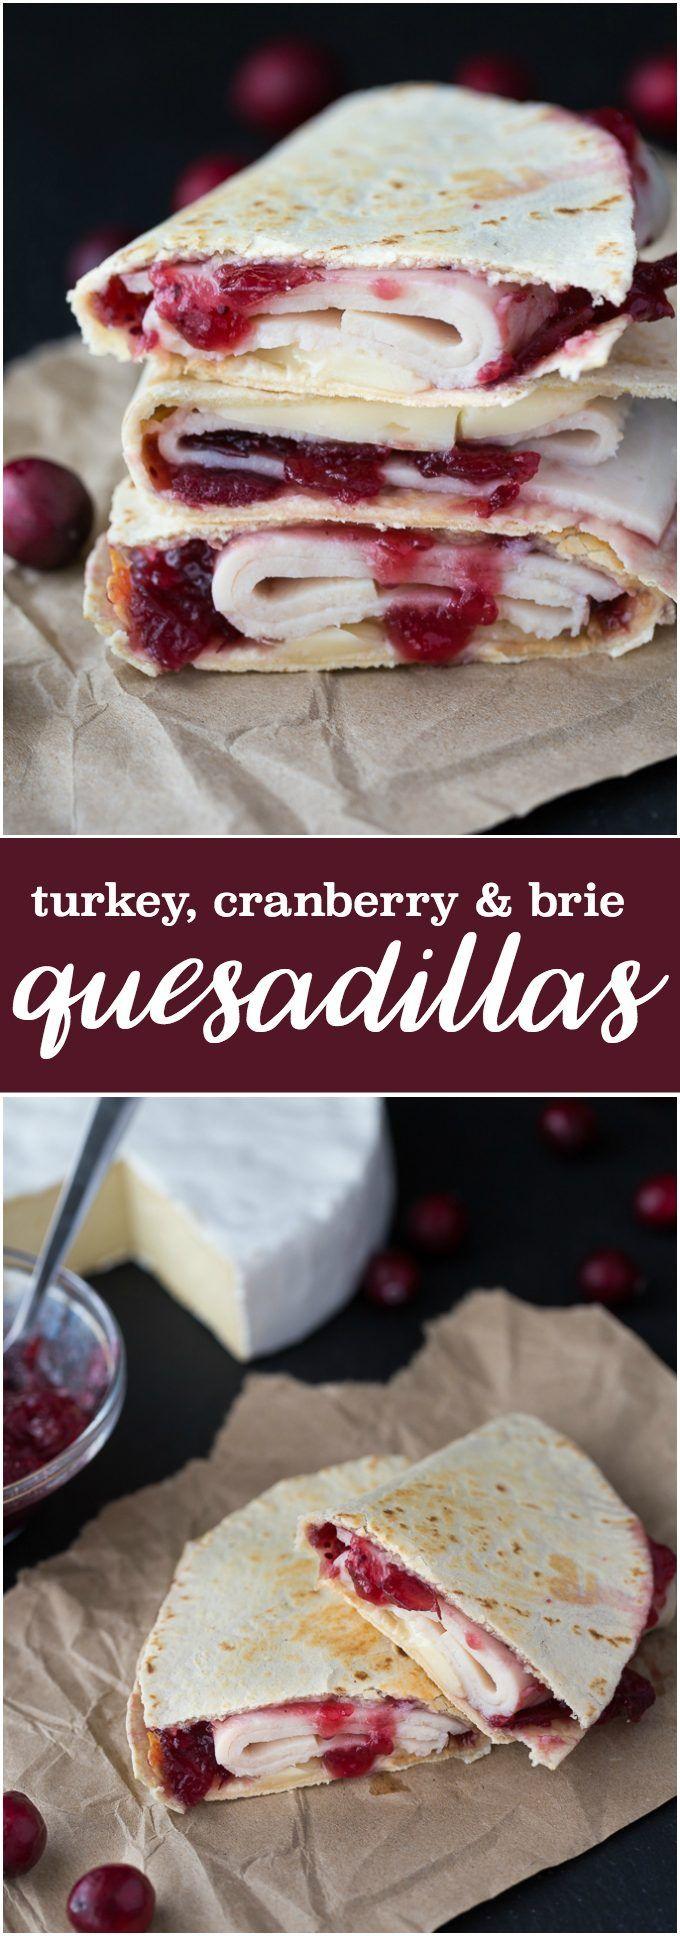 Turkey, Cranberry & Brie Quesadillas